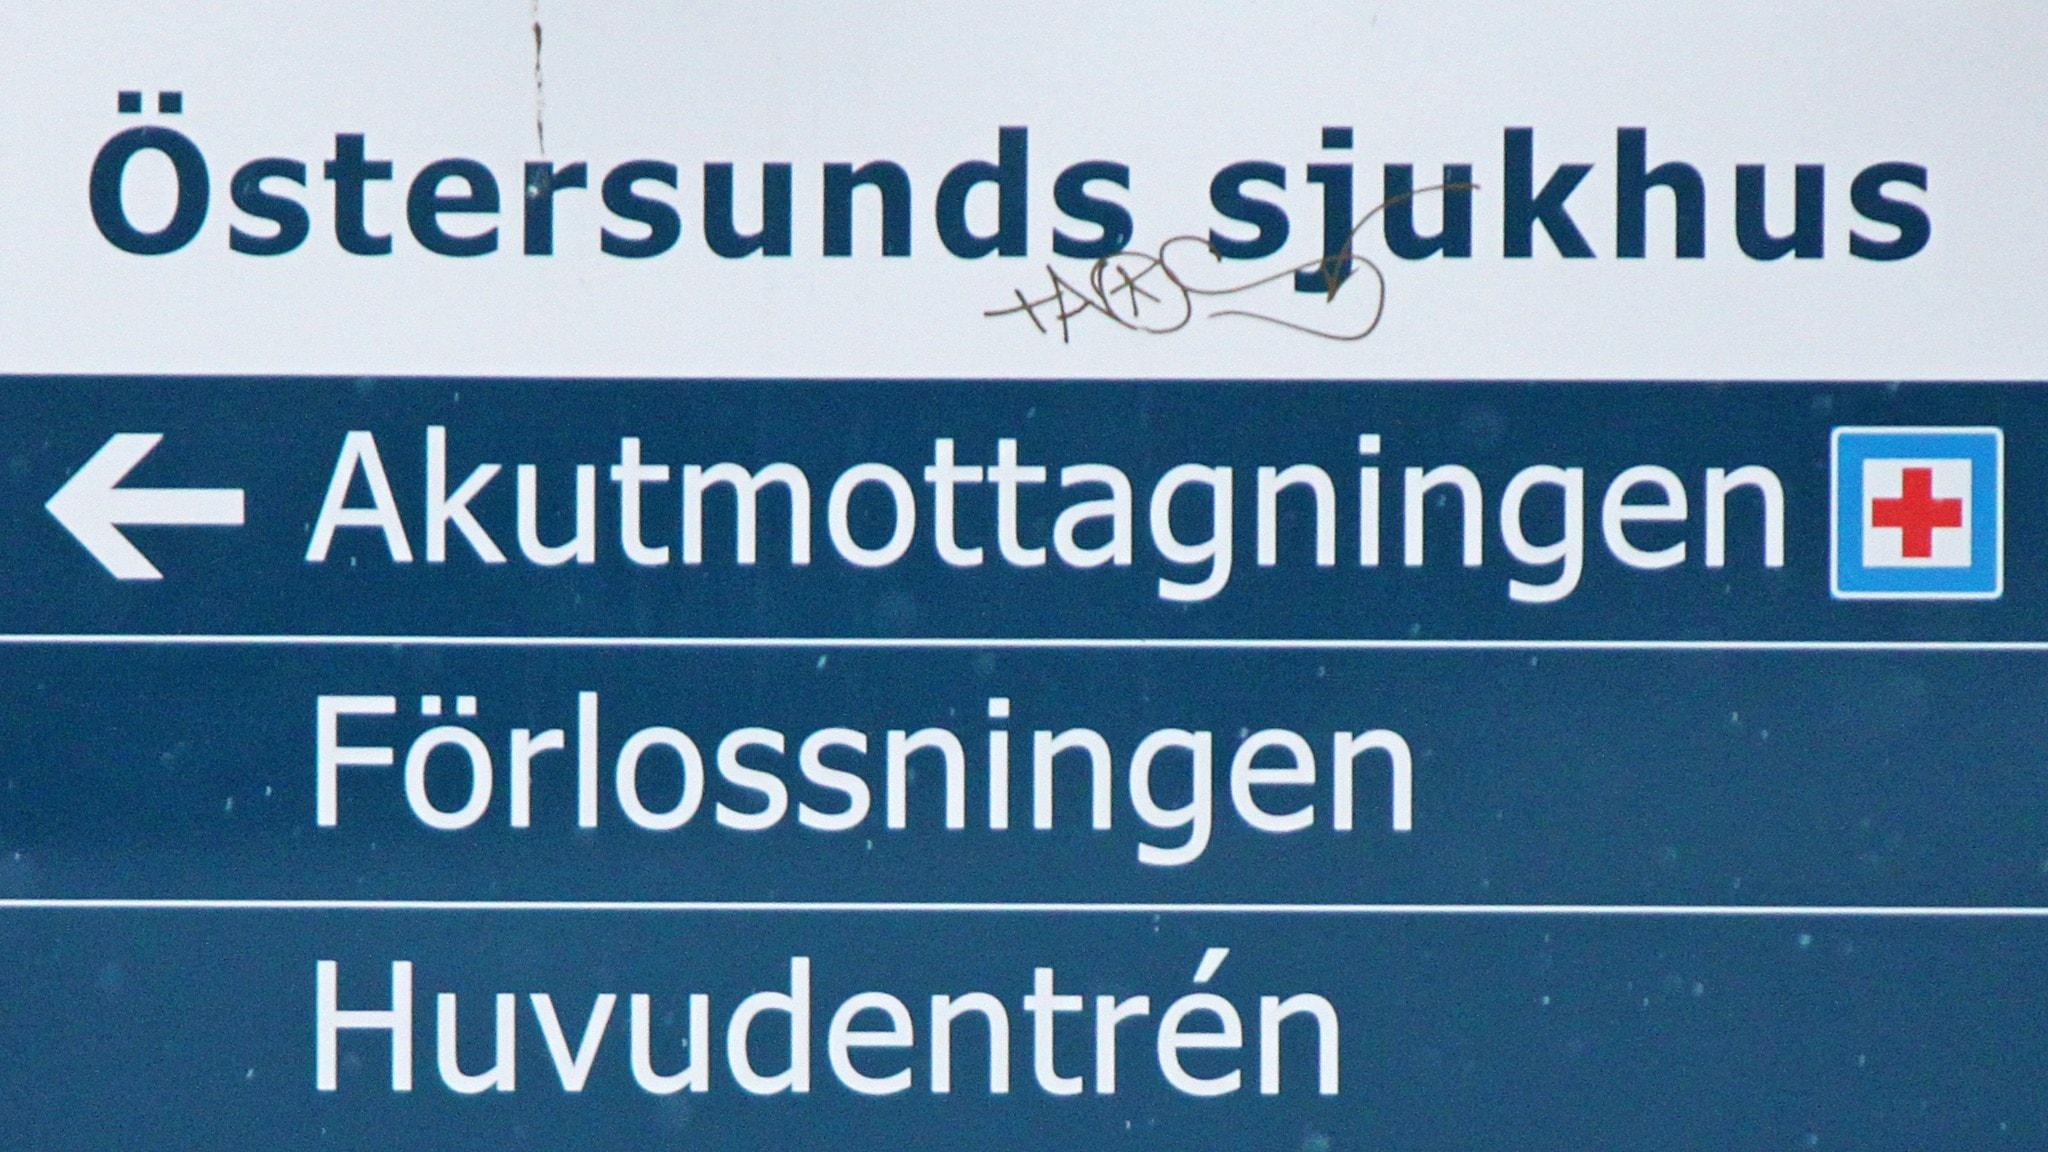 Akutmottagningen tvingades införa stabsläge - P4 Jämtland